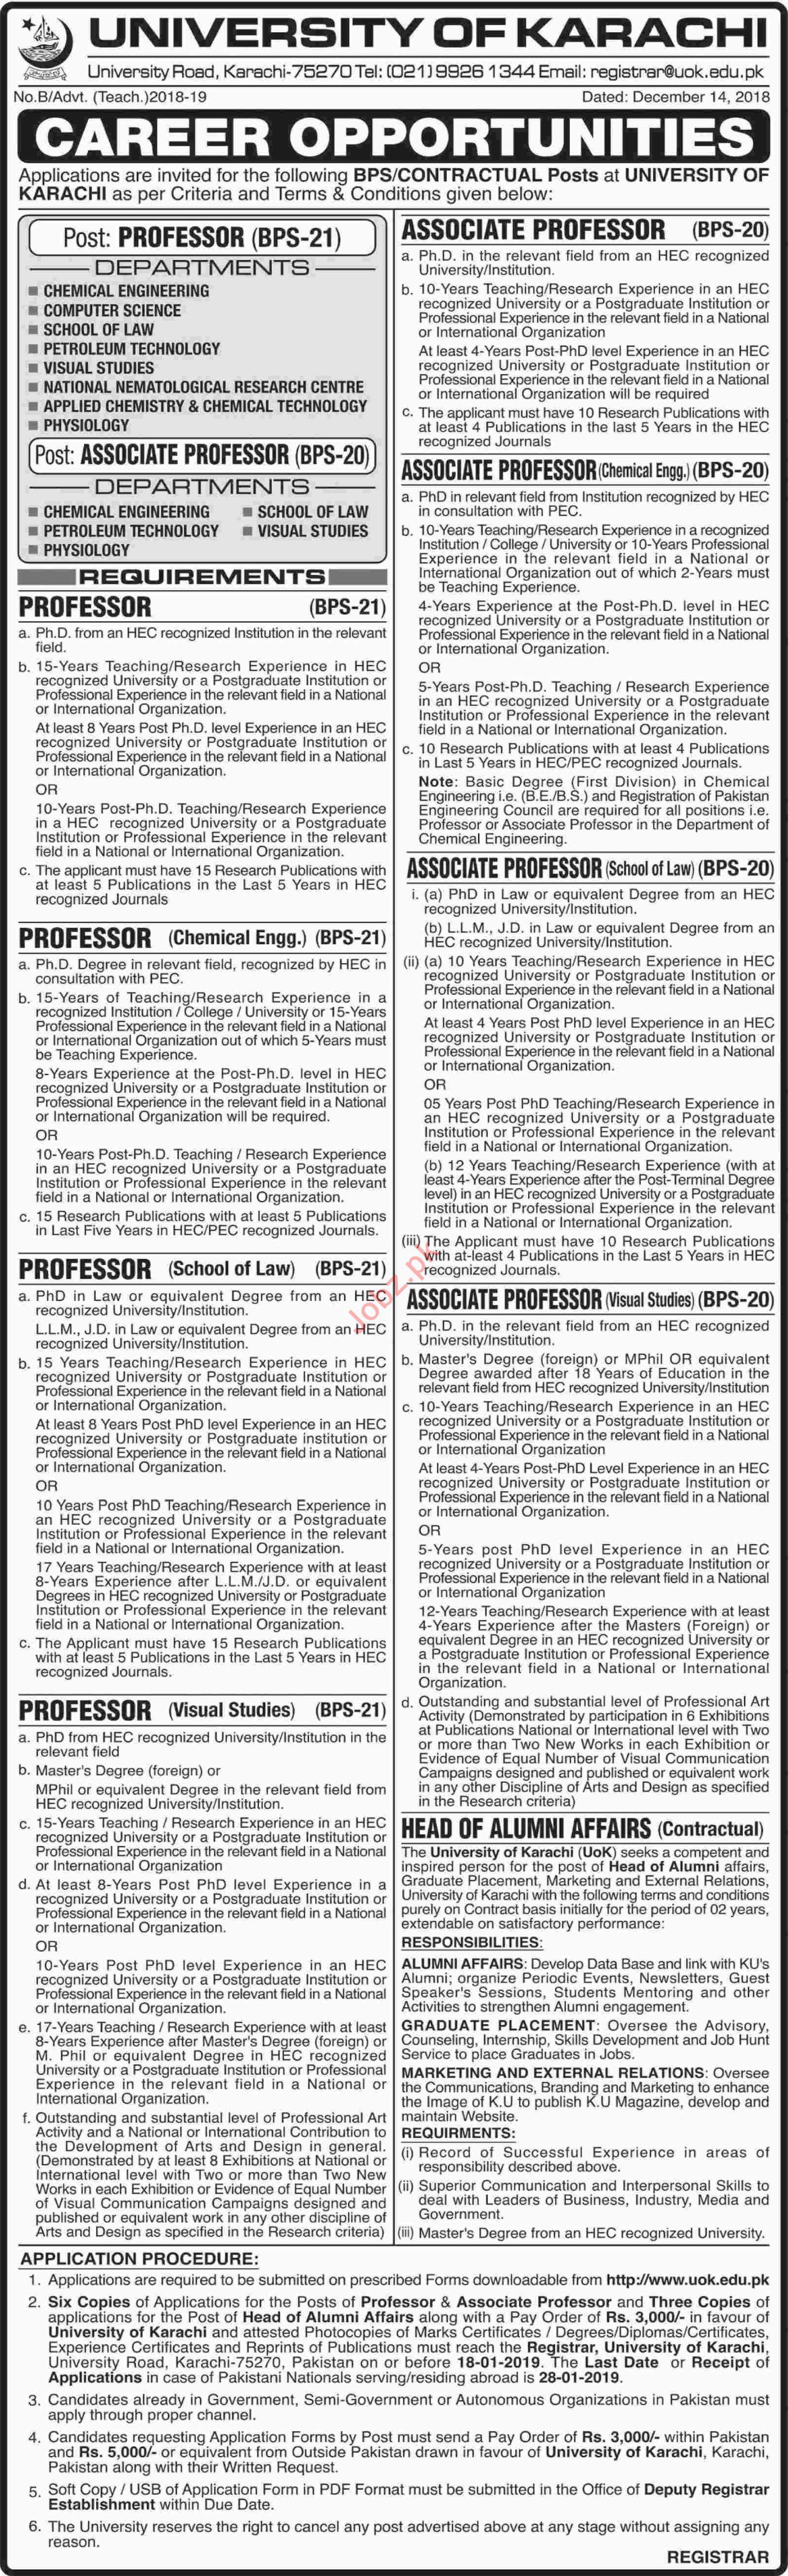 University of Karachi Professor Chemical Engineering Jobs